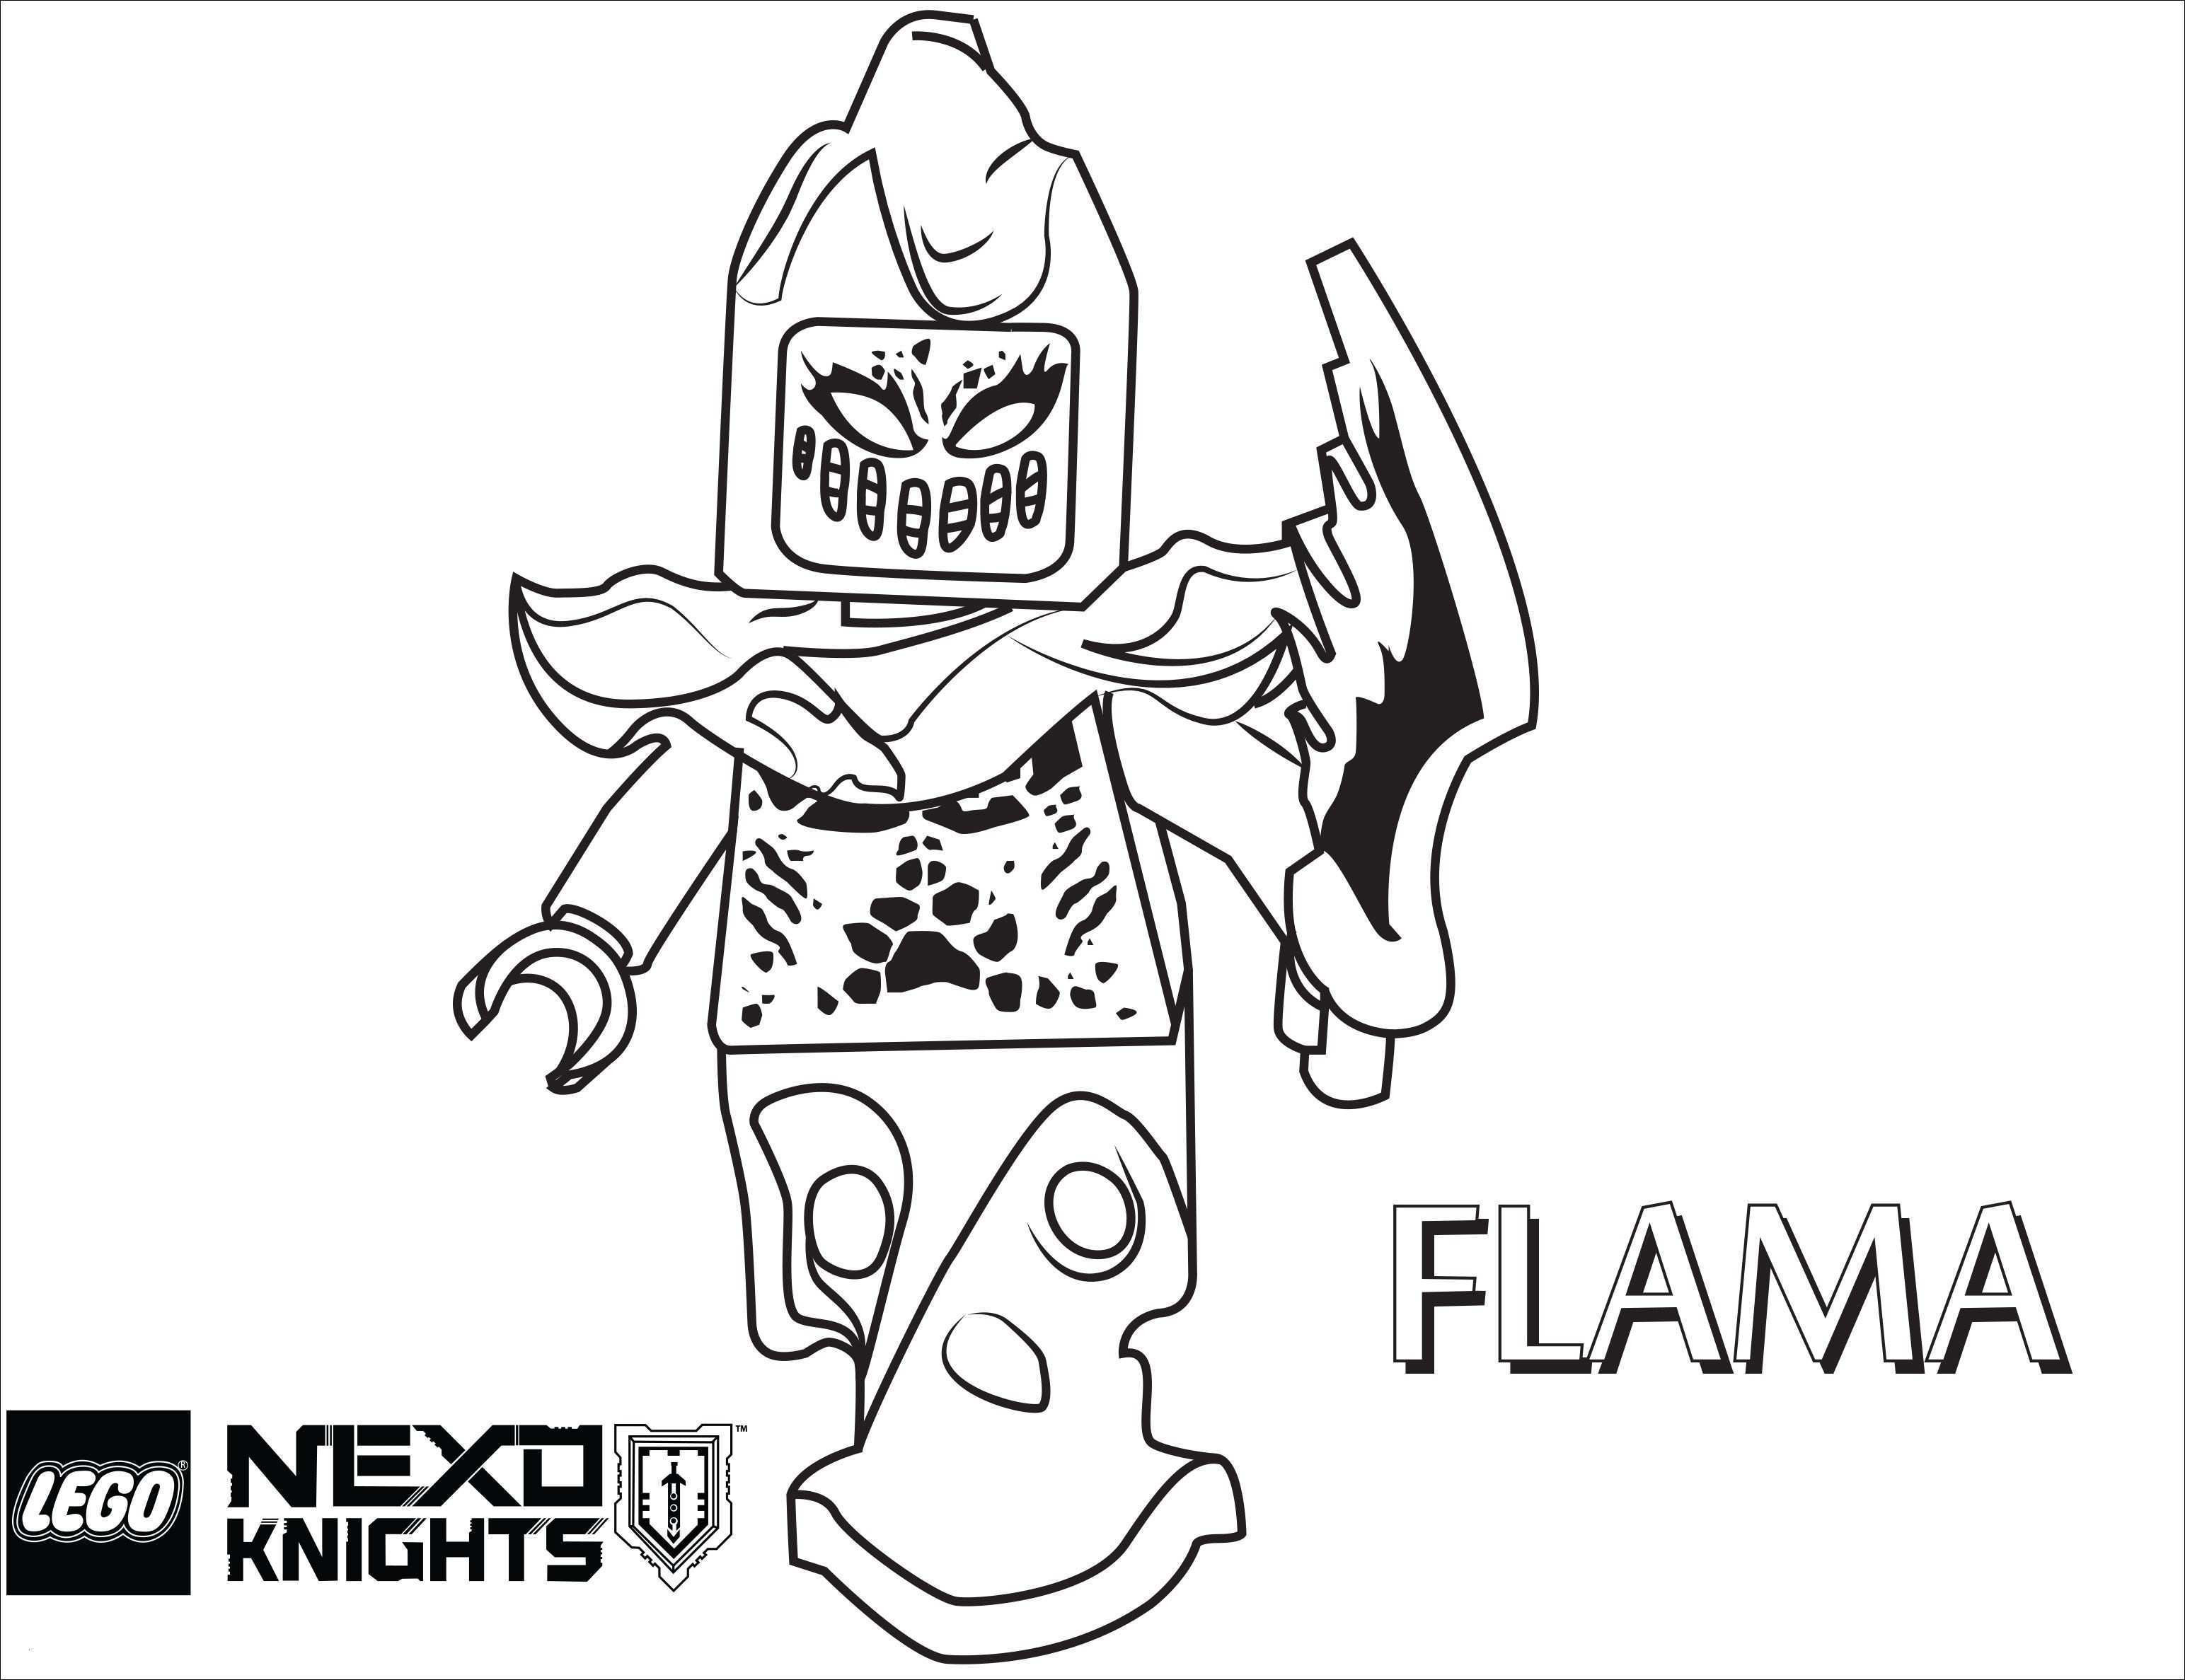 Ausmalbild Nexo Knights Genial Lego Nexo Knights Malvorlagen Bild Ausmalbilder Nexo Knights Zum Stock